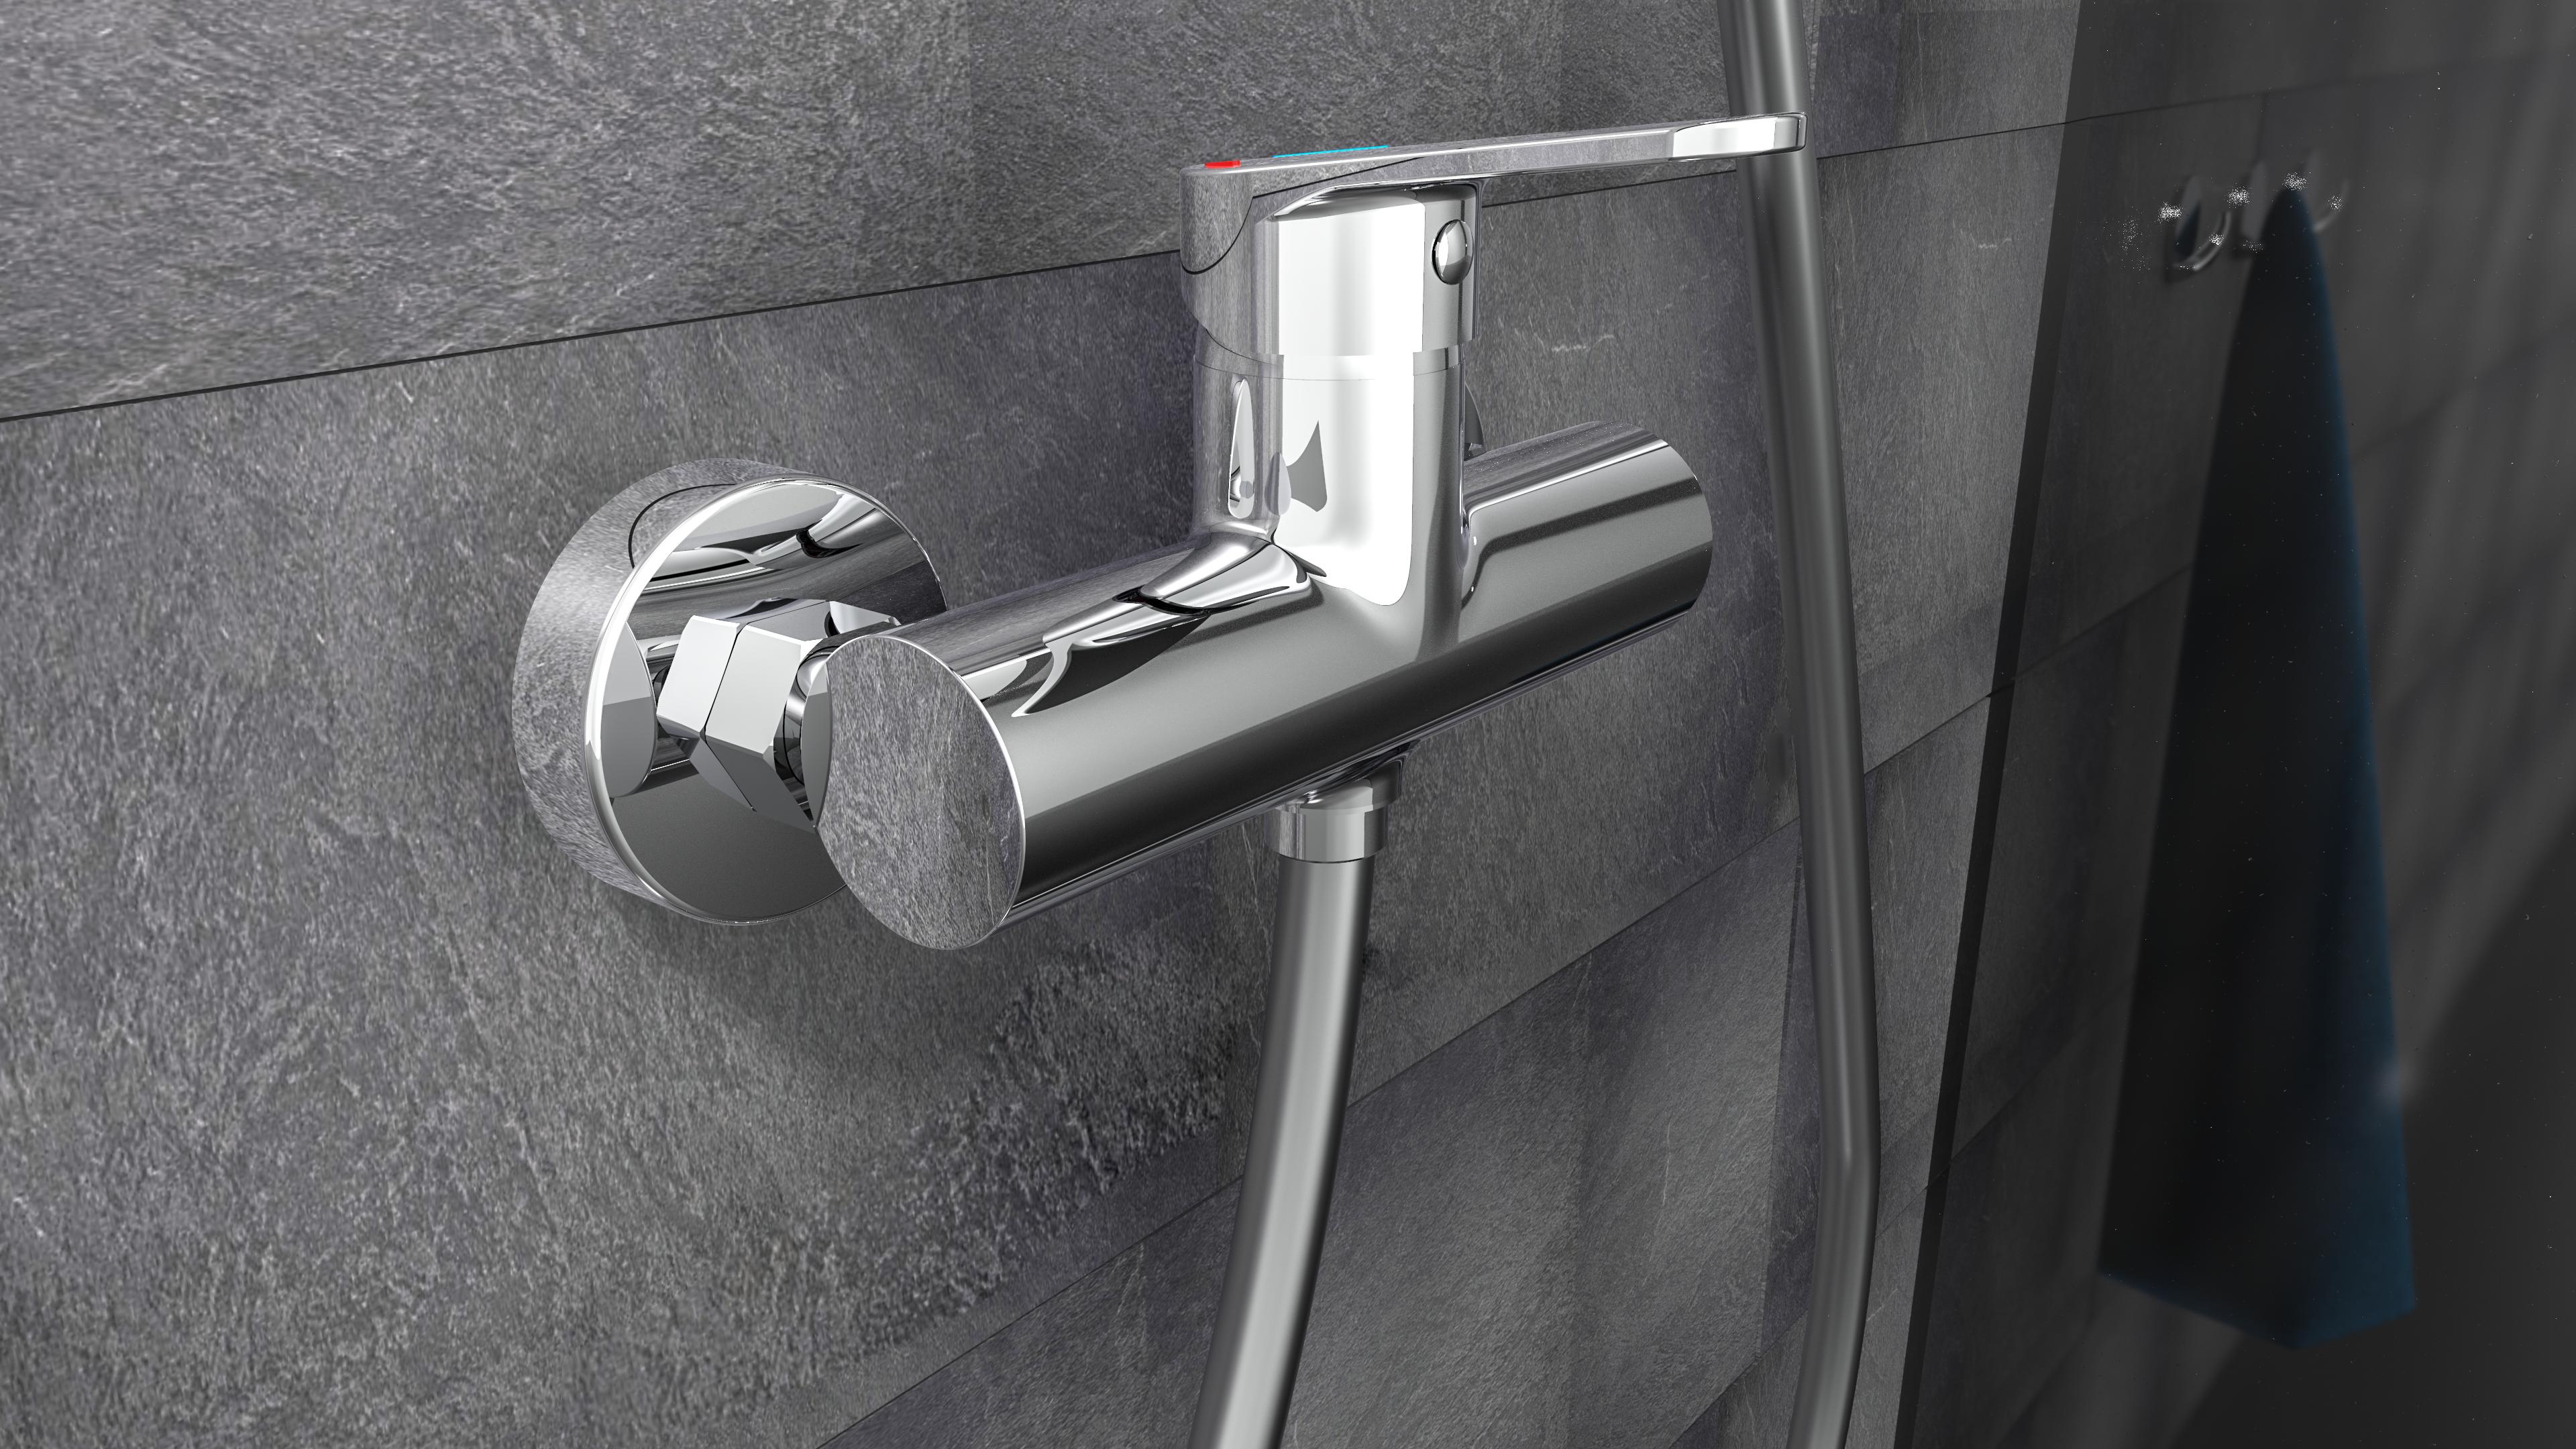 Duscharmatur Futura Badarmatur Wasserhahn Fur Dusche Chrom In 2020 Badarmaturen Duscharmatur Armaturen Bad